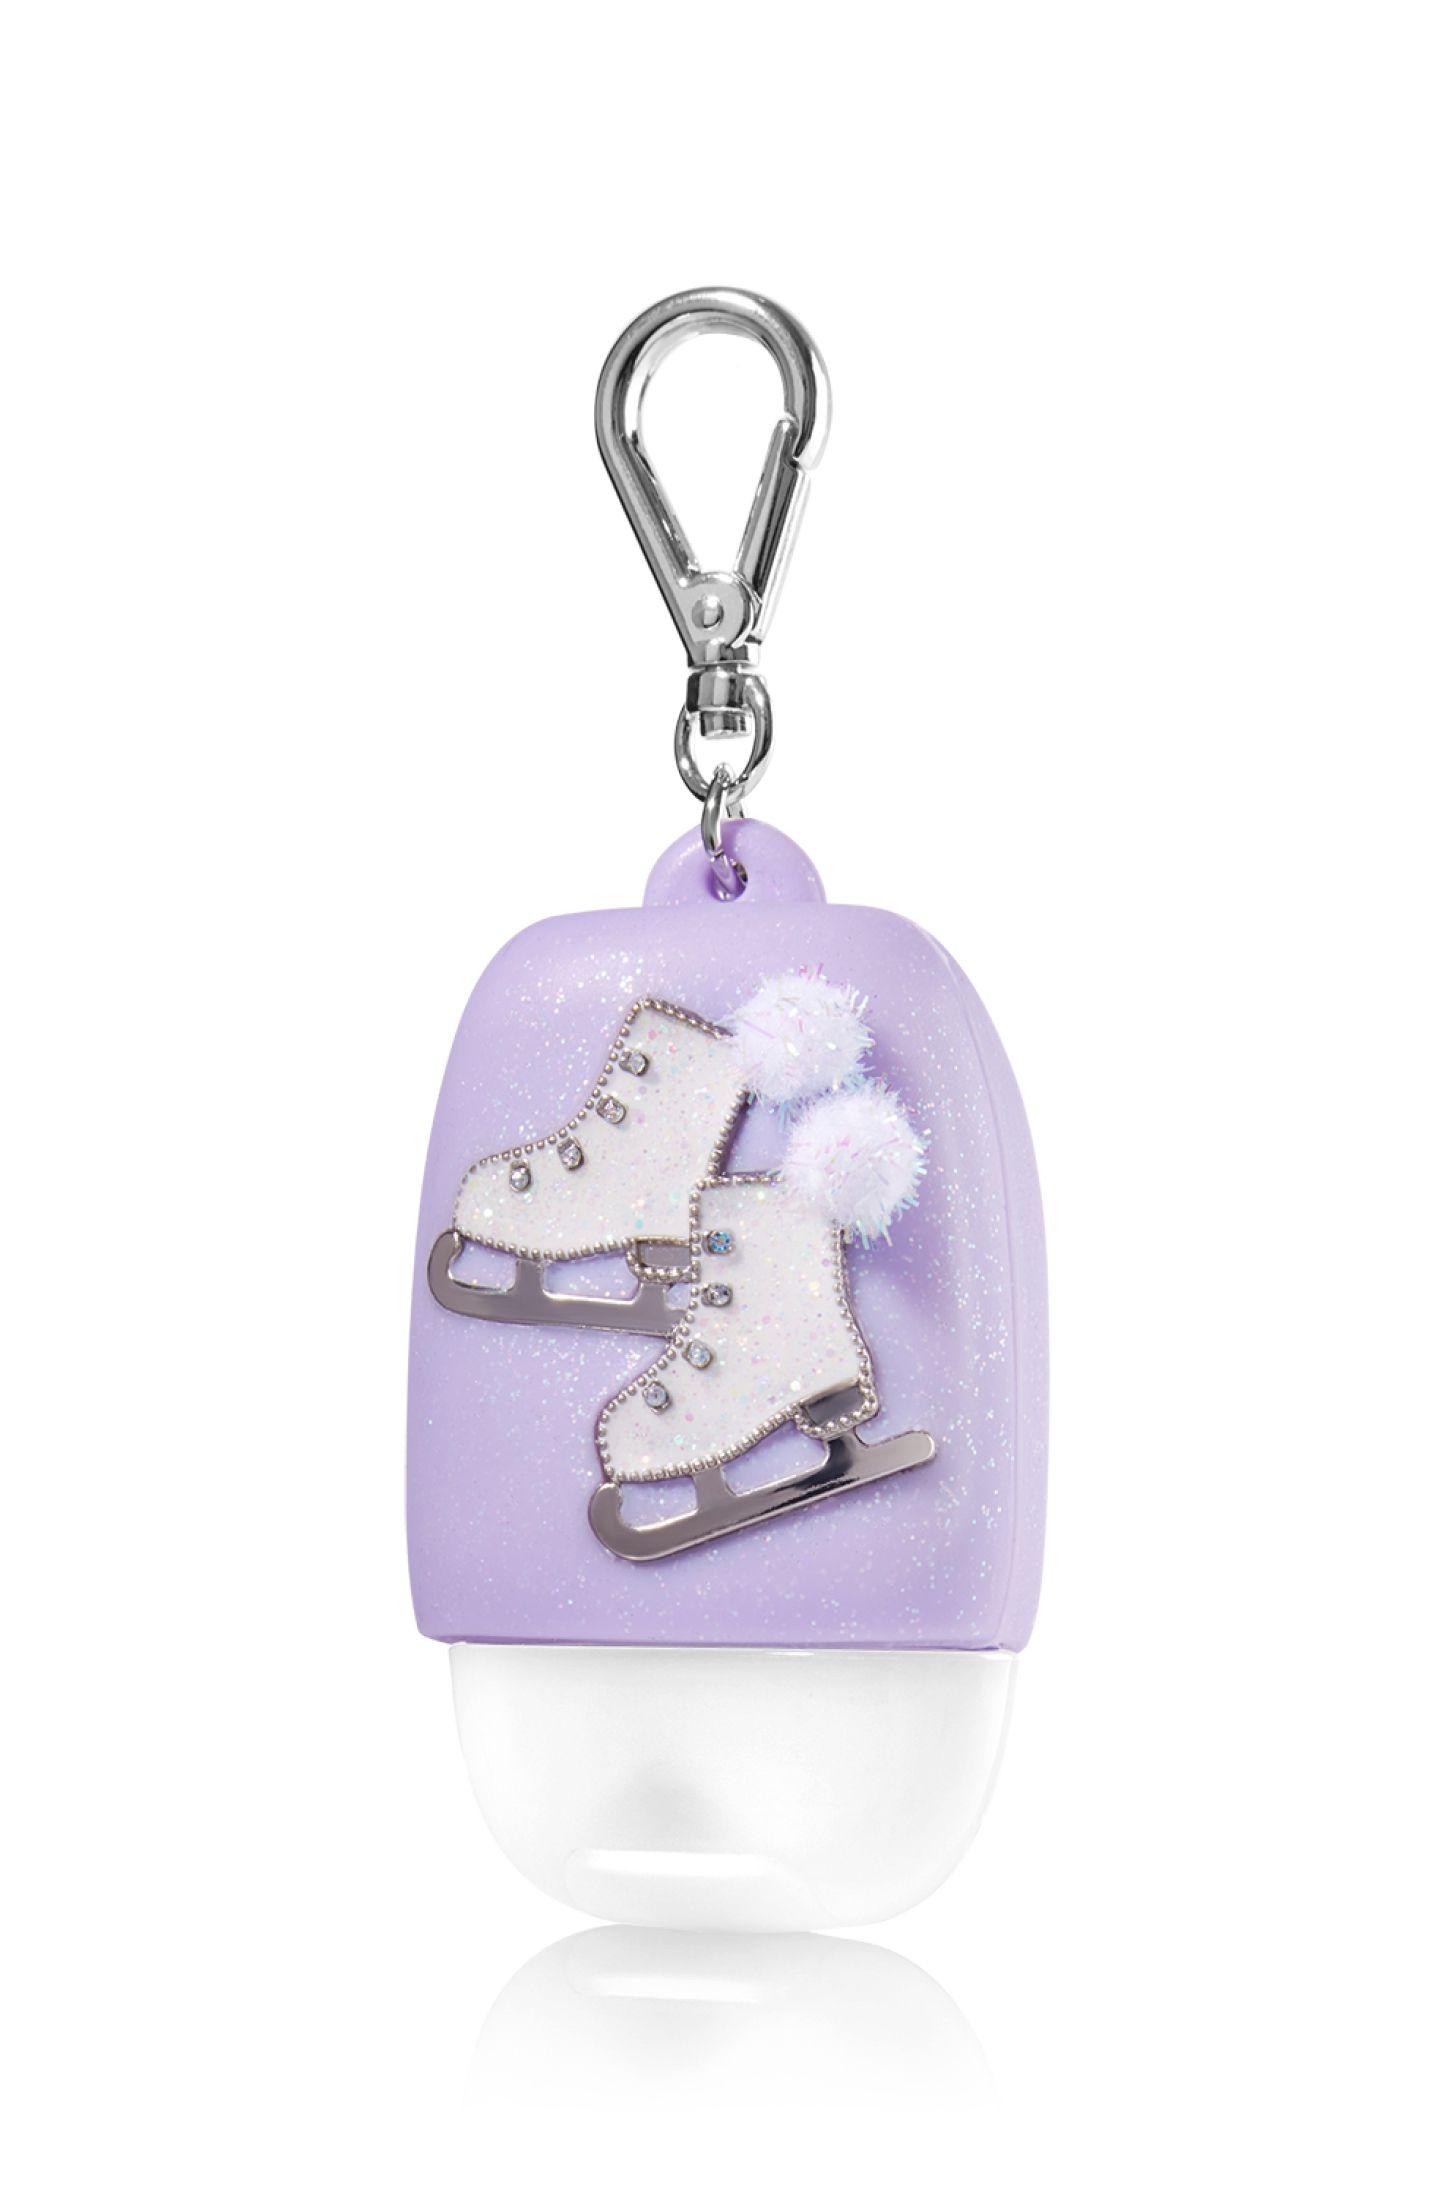 Ice Skates Pocketbac Holder Bath Body Works Bath Body